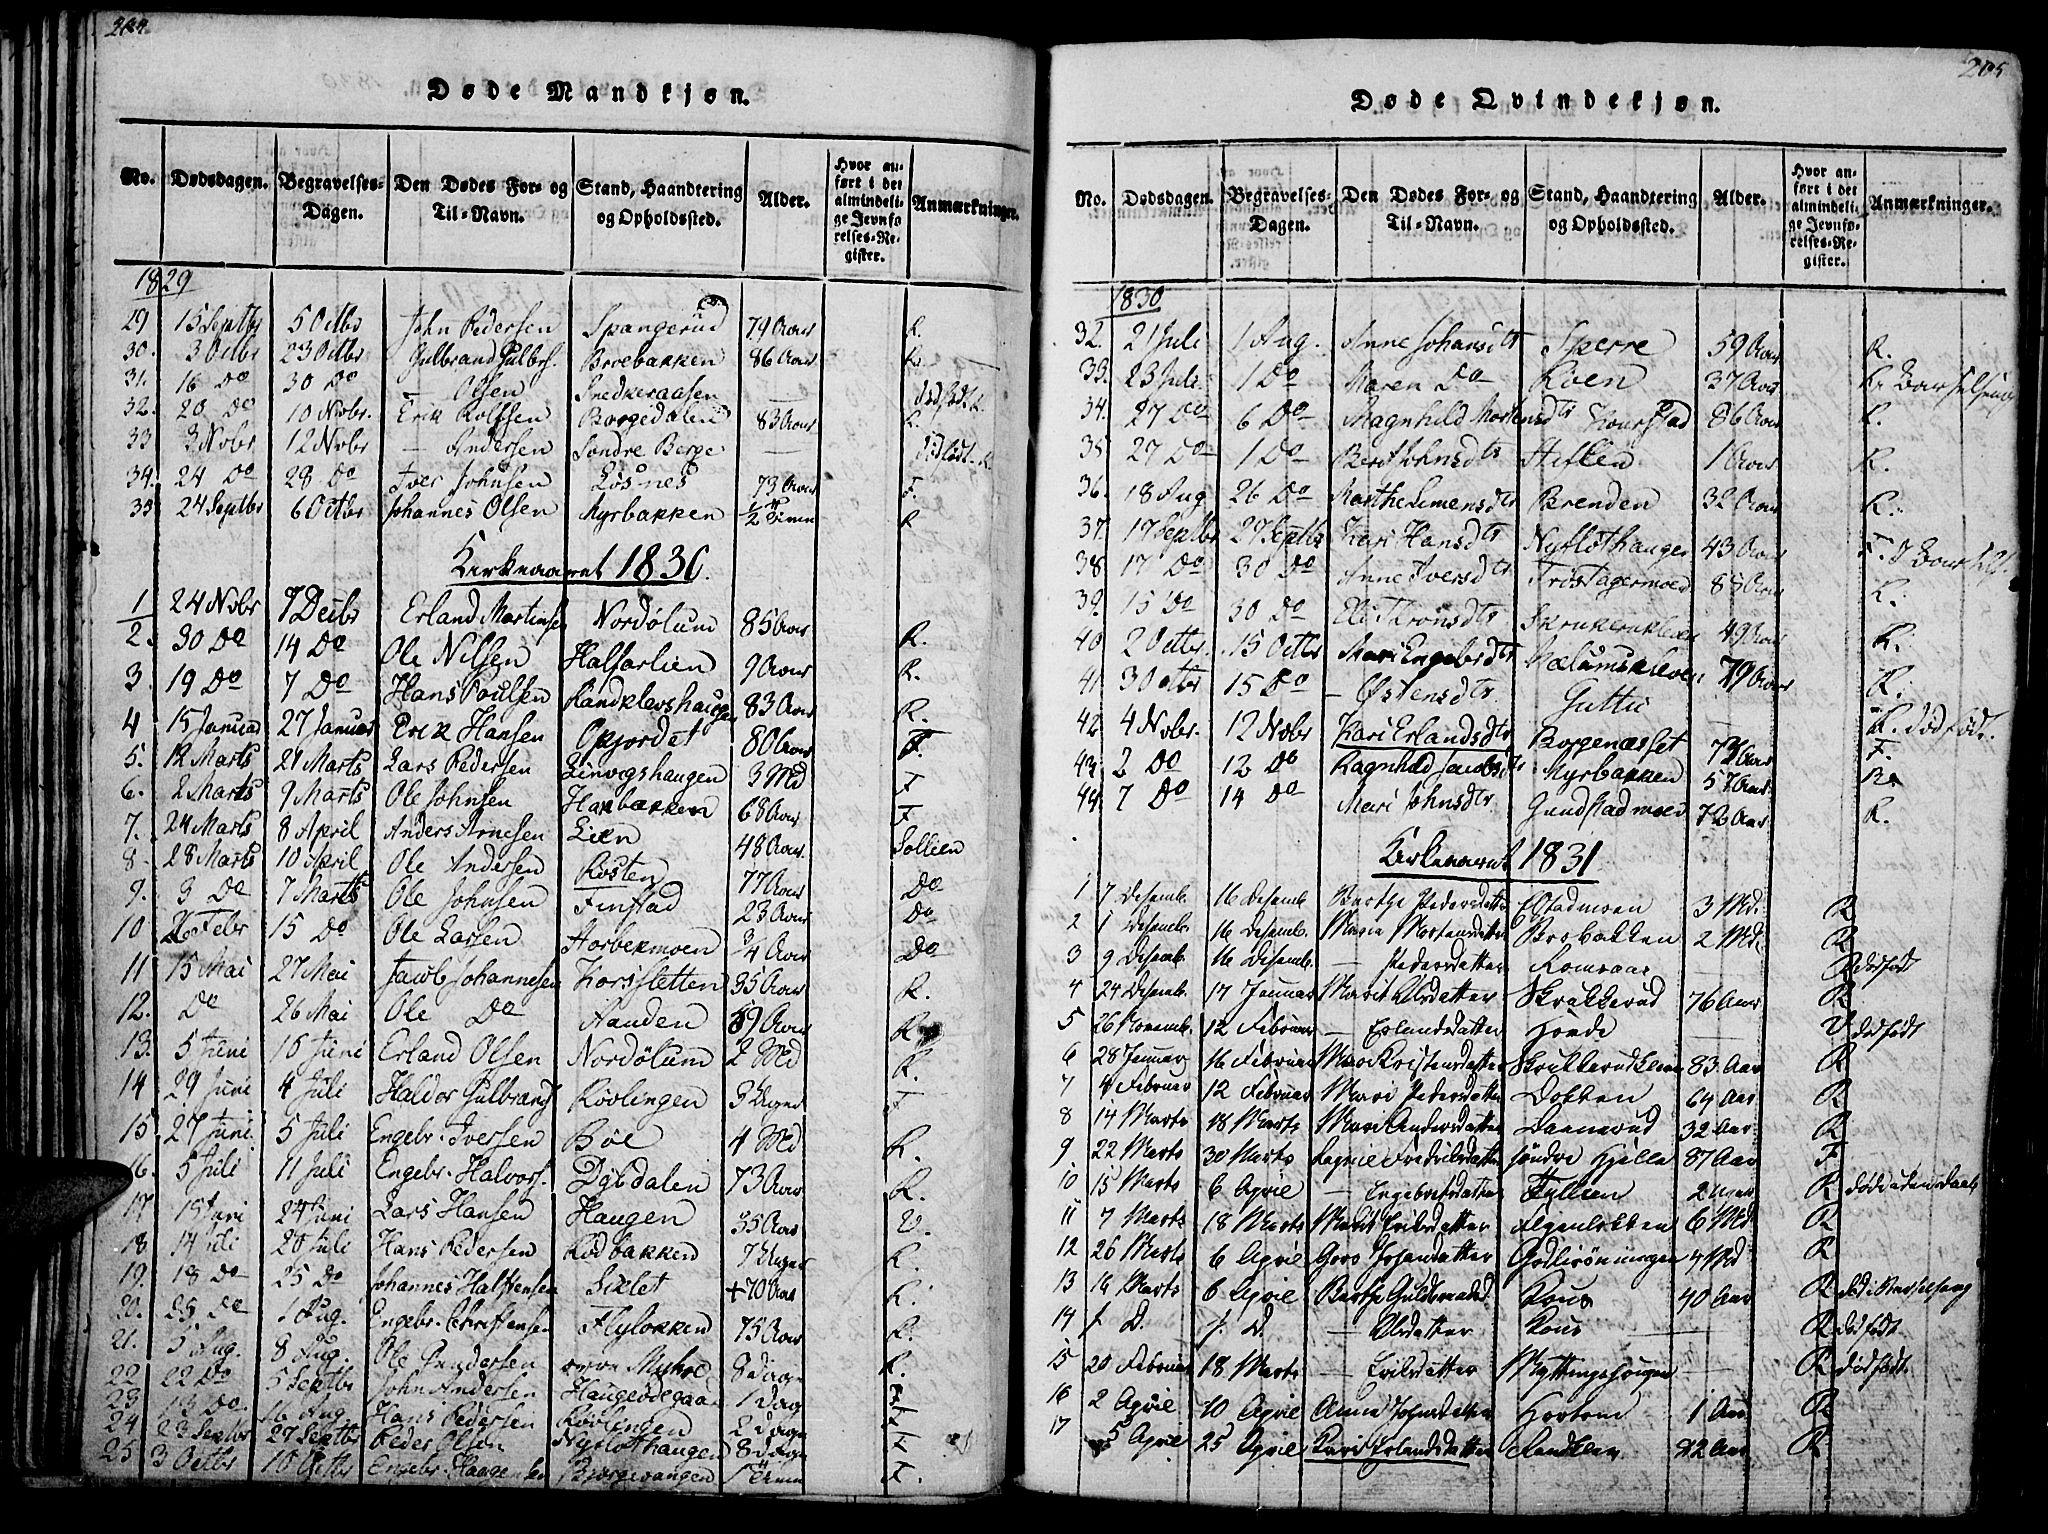 SAH, Ringebu prestekontor, Ministerialbok nr. 4, 1821-1839, s. 204-205